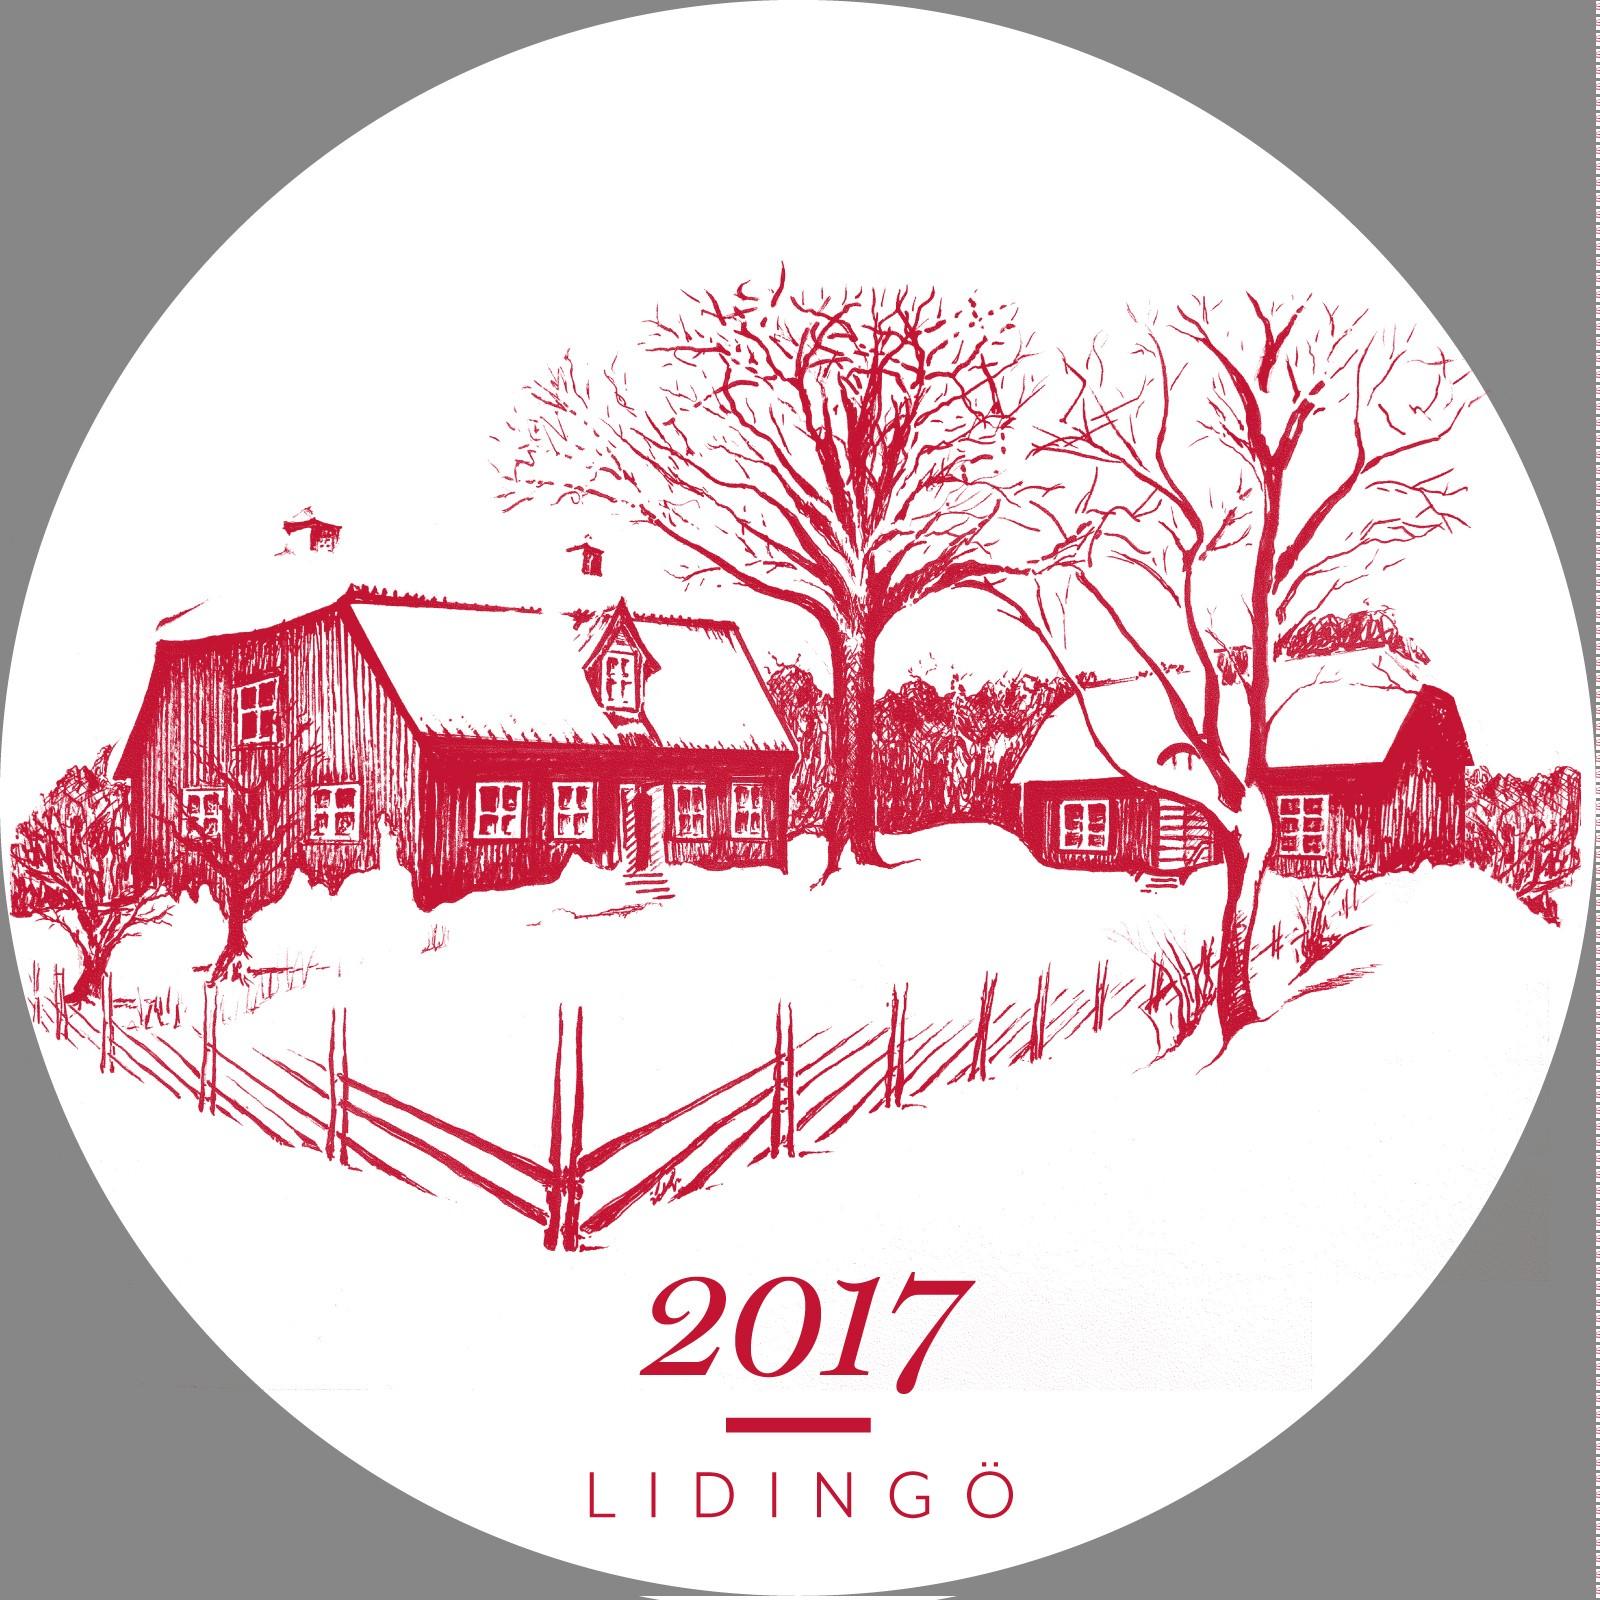 julkulor-Lidingö-2017-helt-i-röd